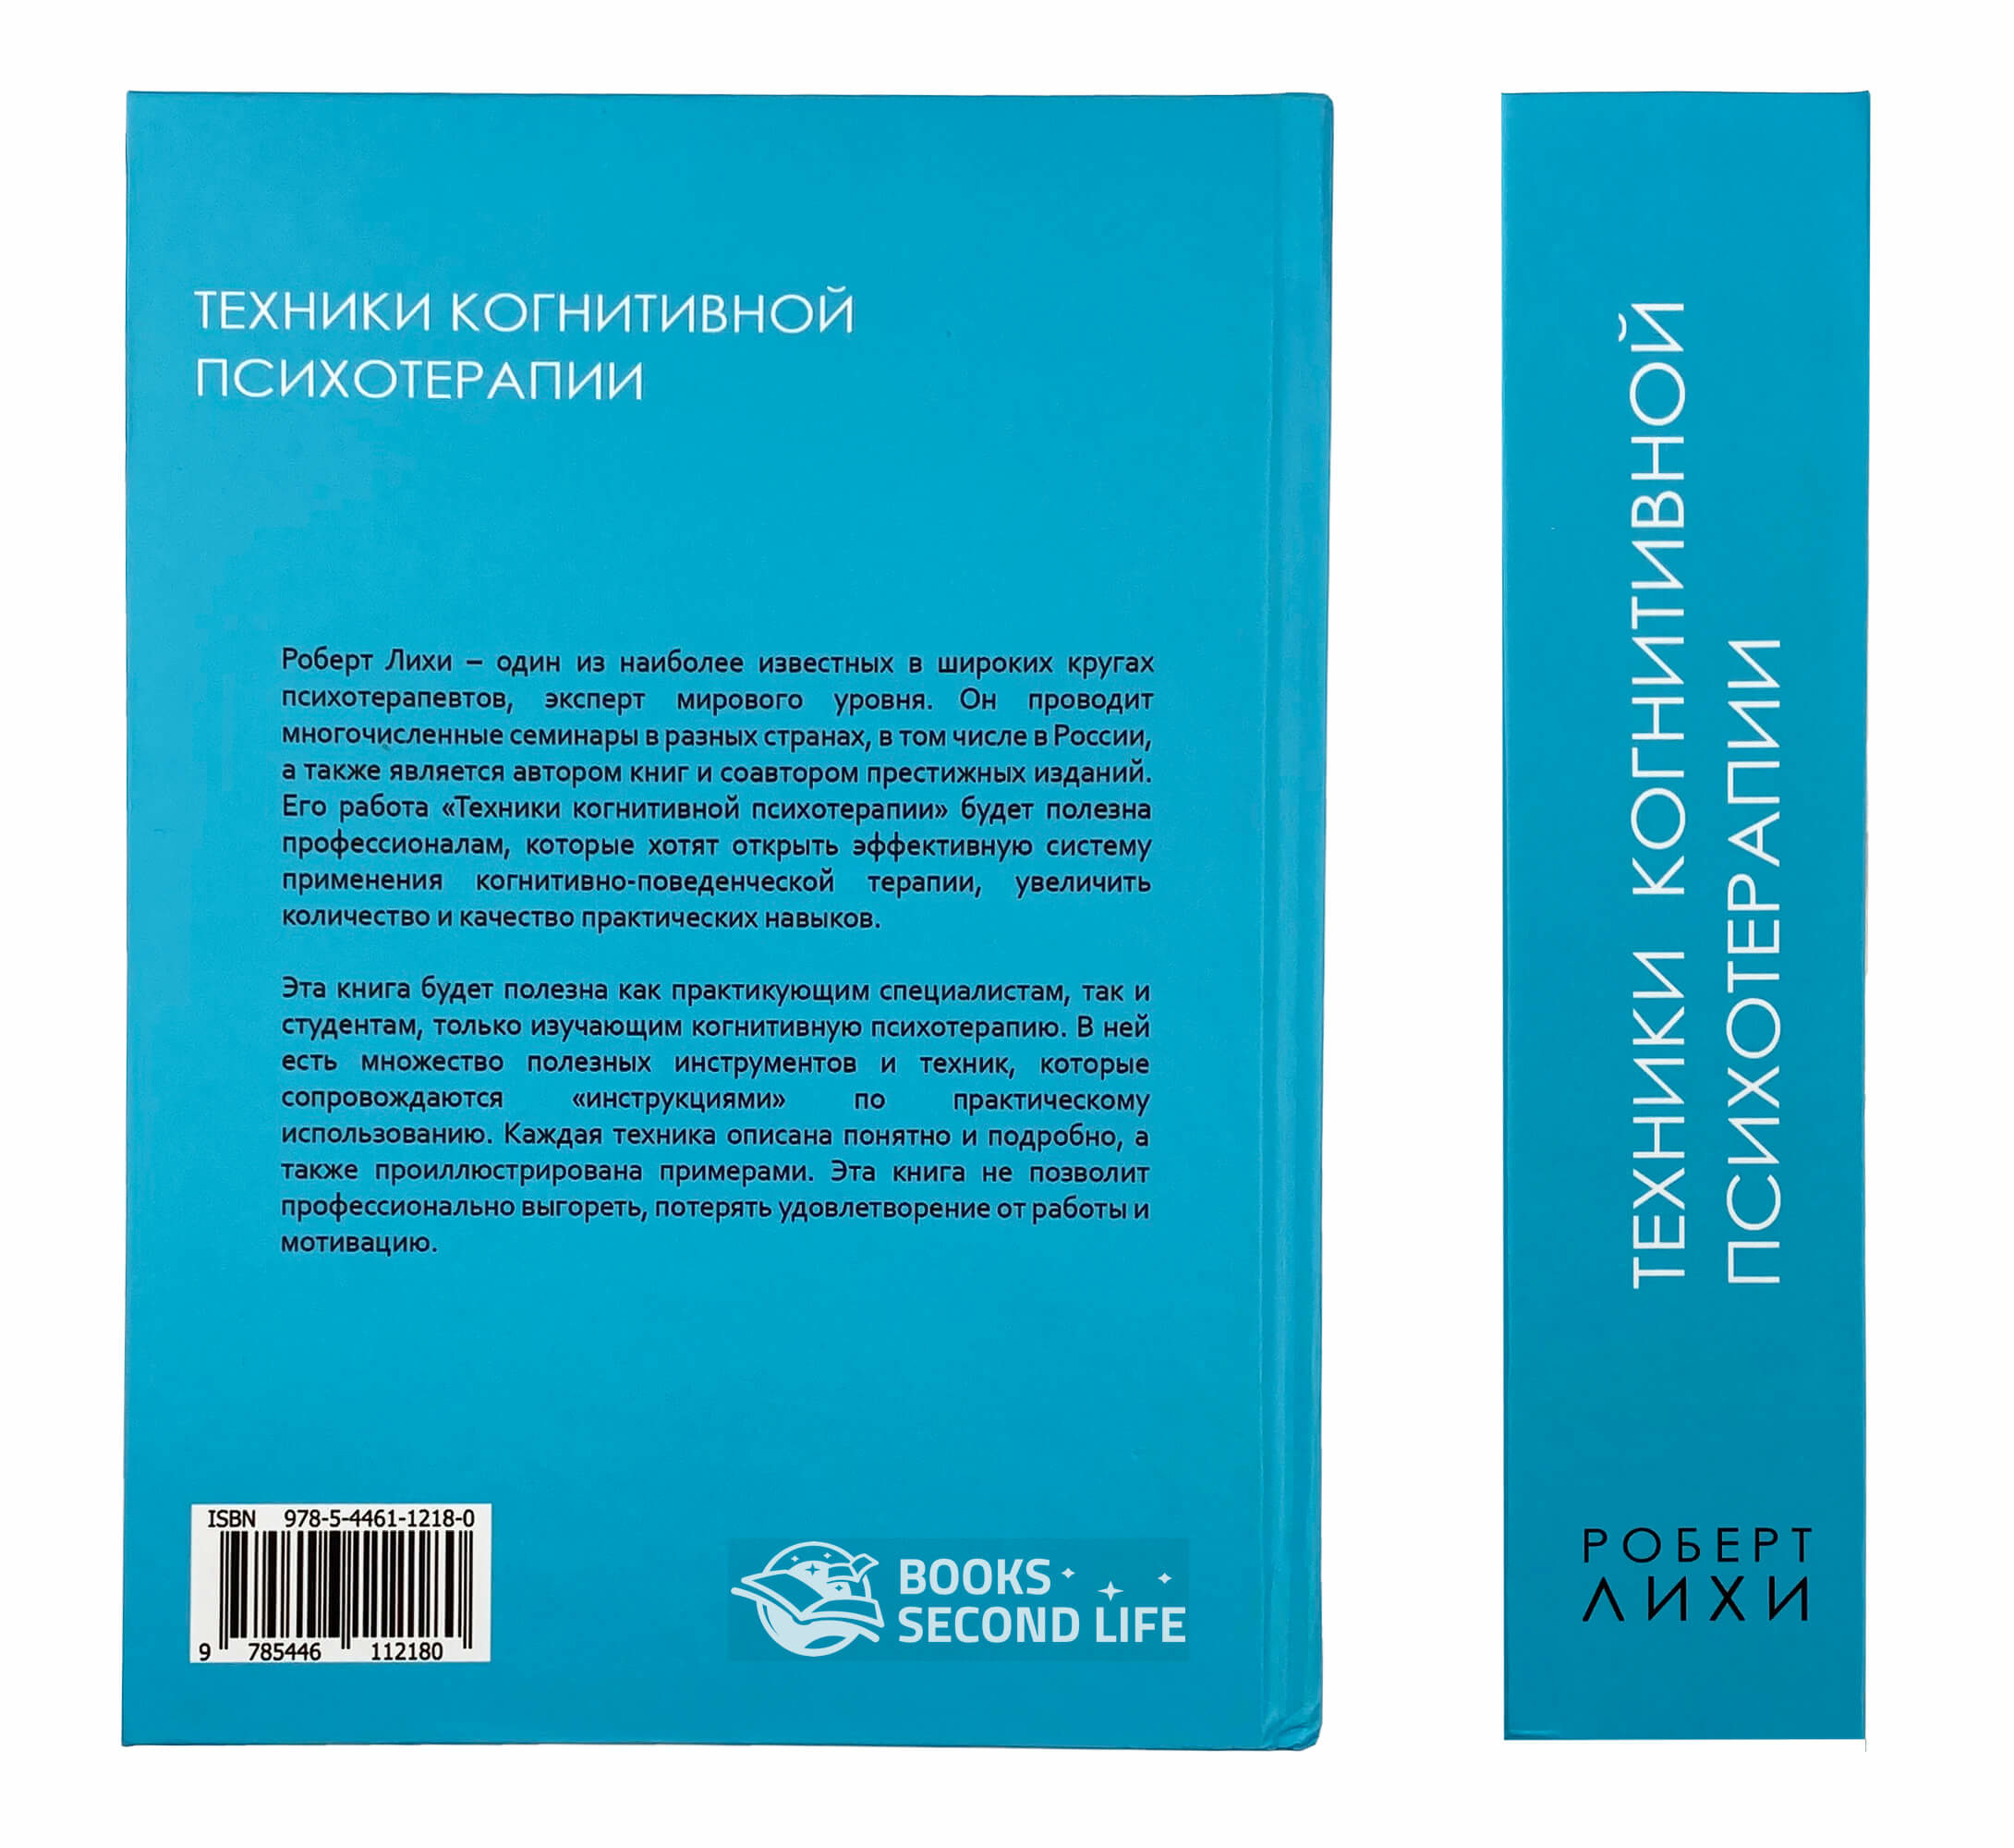 Техники когнитивной психотерапии. Автор — Роберт Лихи. Переплет —